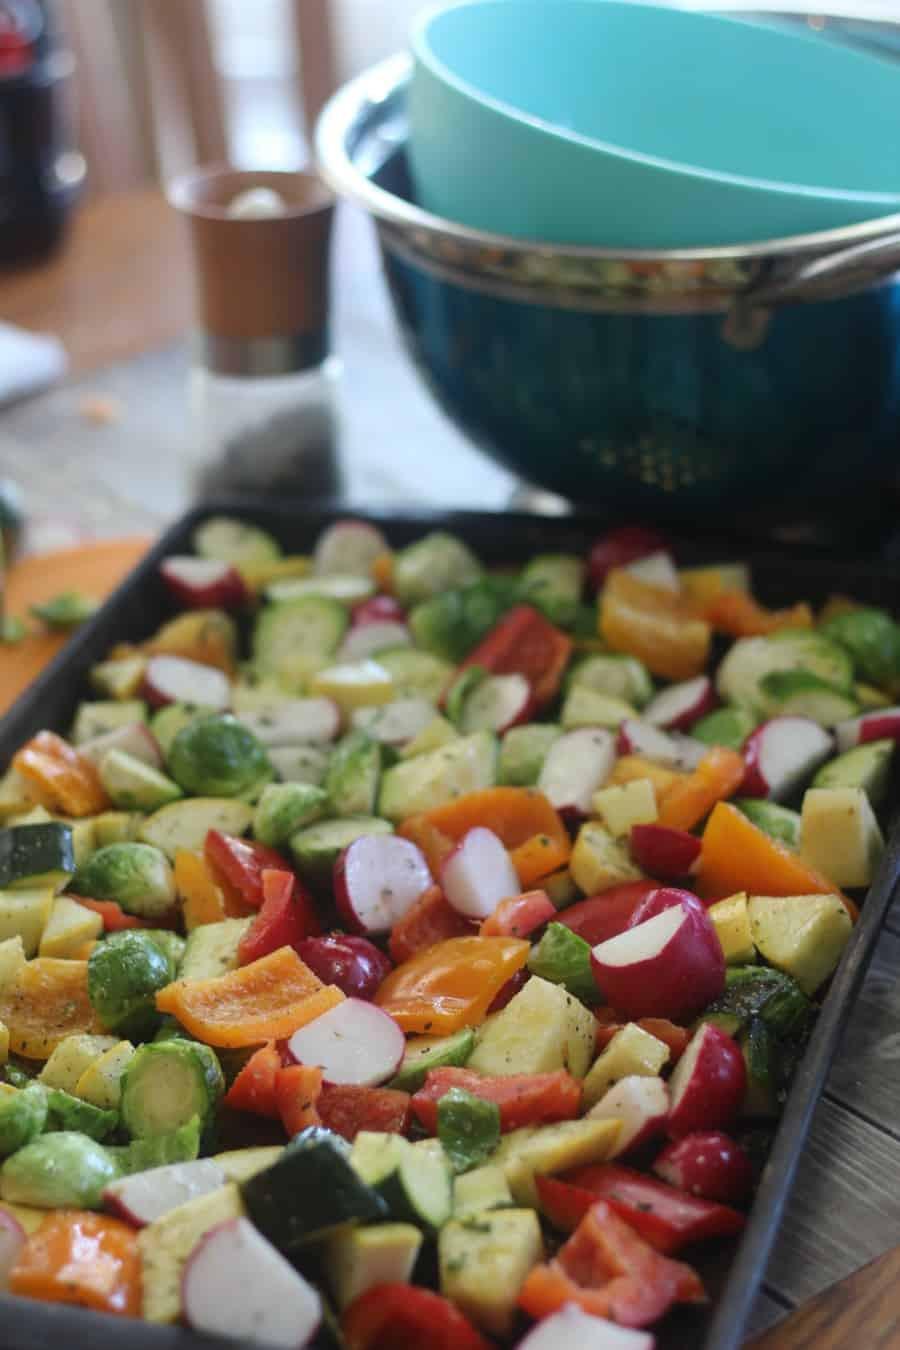 Low Carb Roasted Vegetables  Sheet Pan Roasted Low Carb Veggies